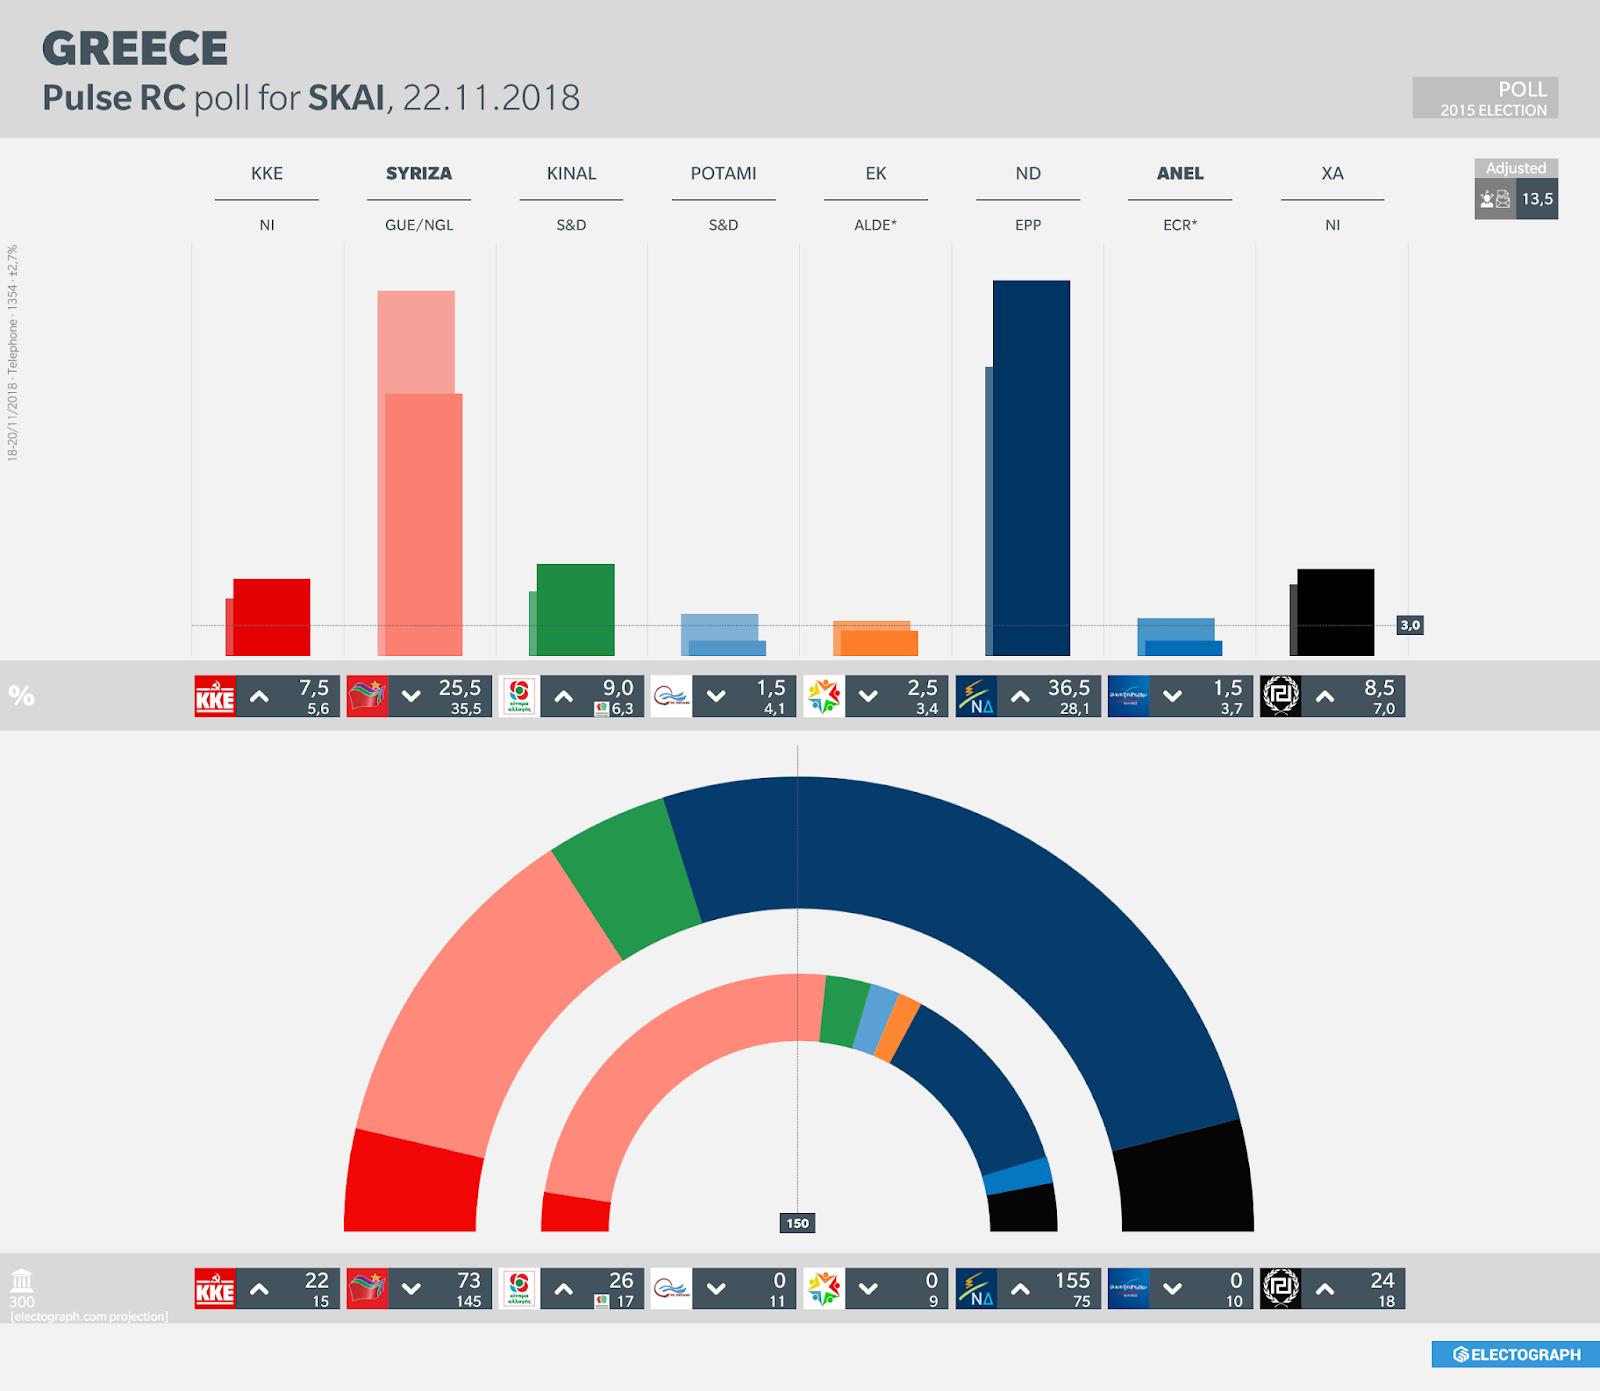 GREECE: Pulse RC poll chart for SKAI, 22 November 2018